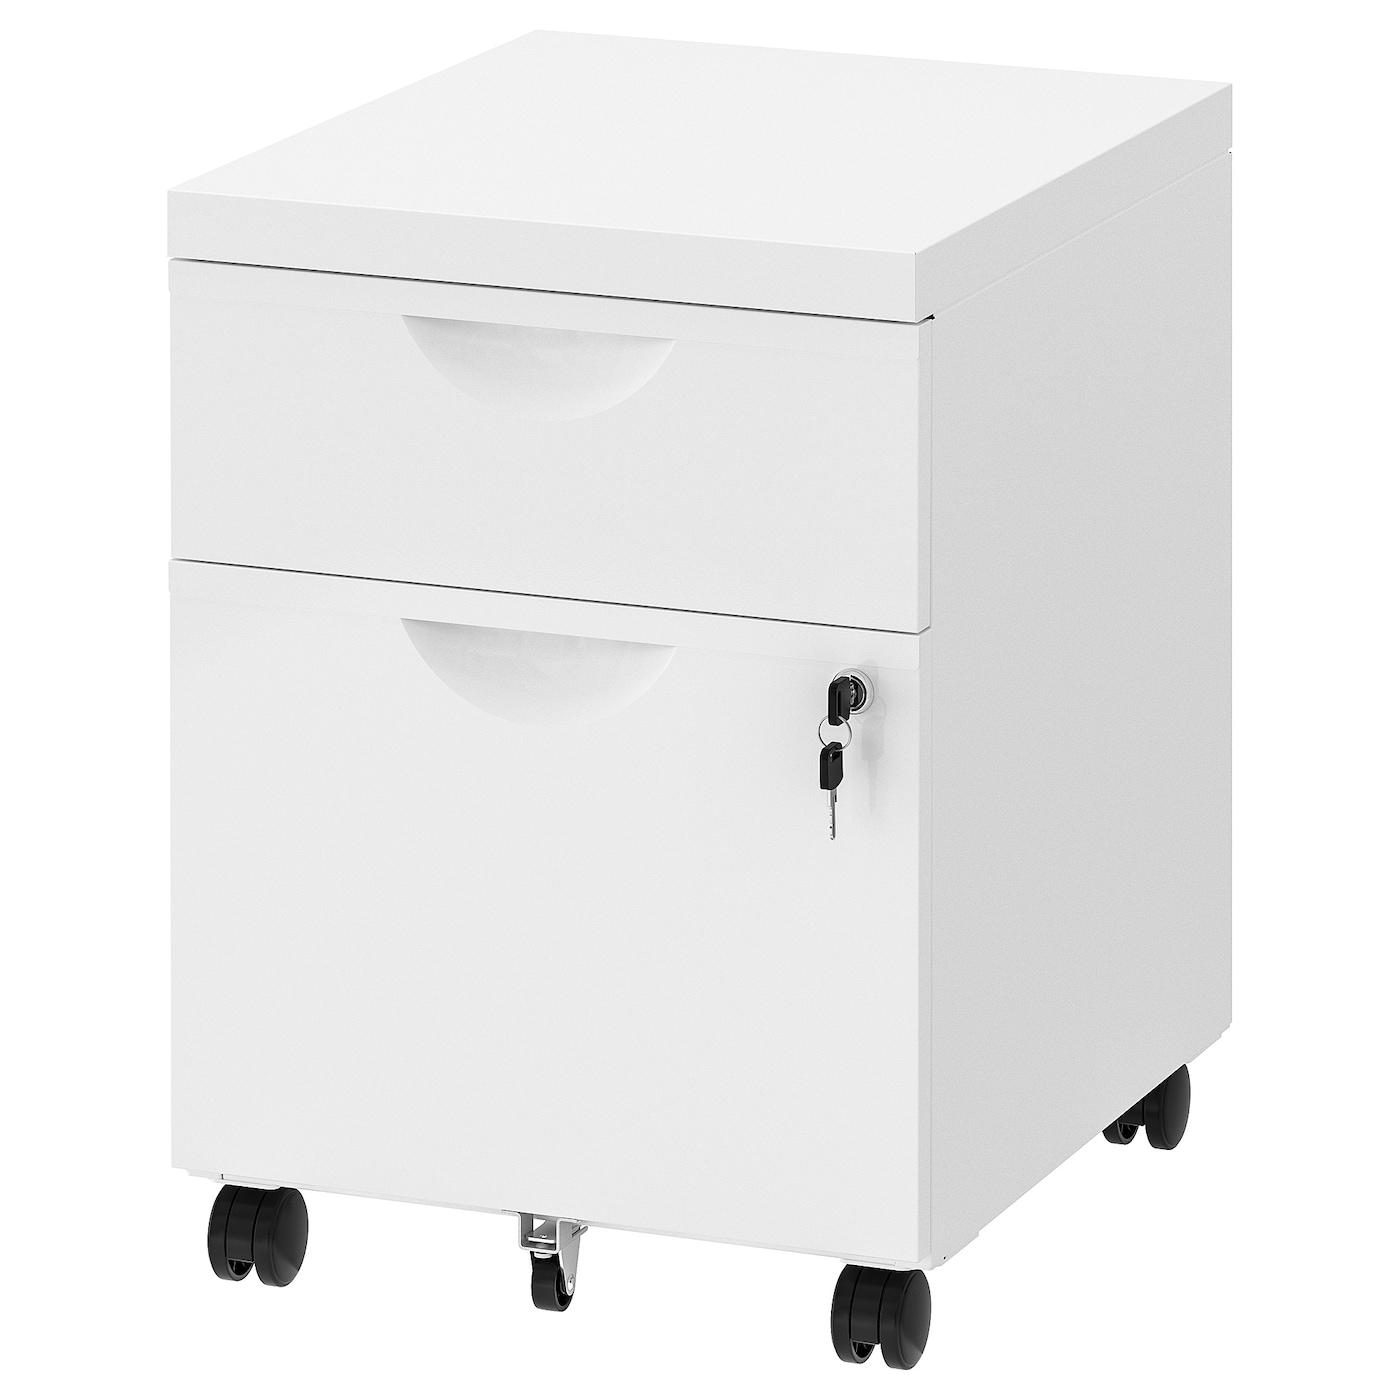 Erik Drawer Unit W 2 Drawers On Casters White 16 1 8x22 1 2 Ikea